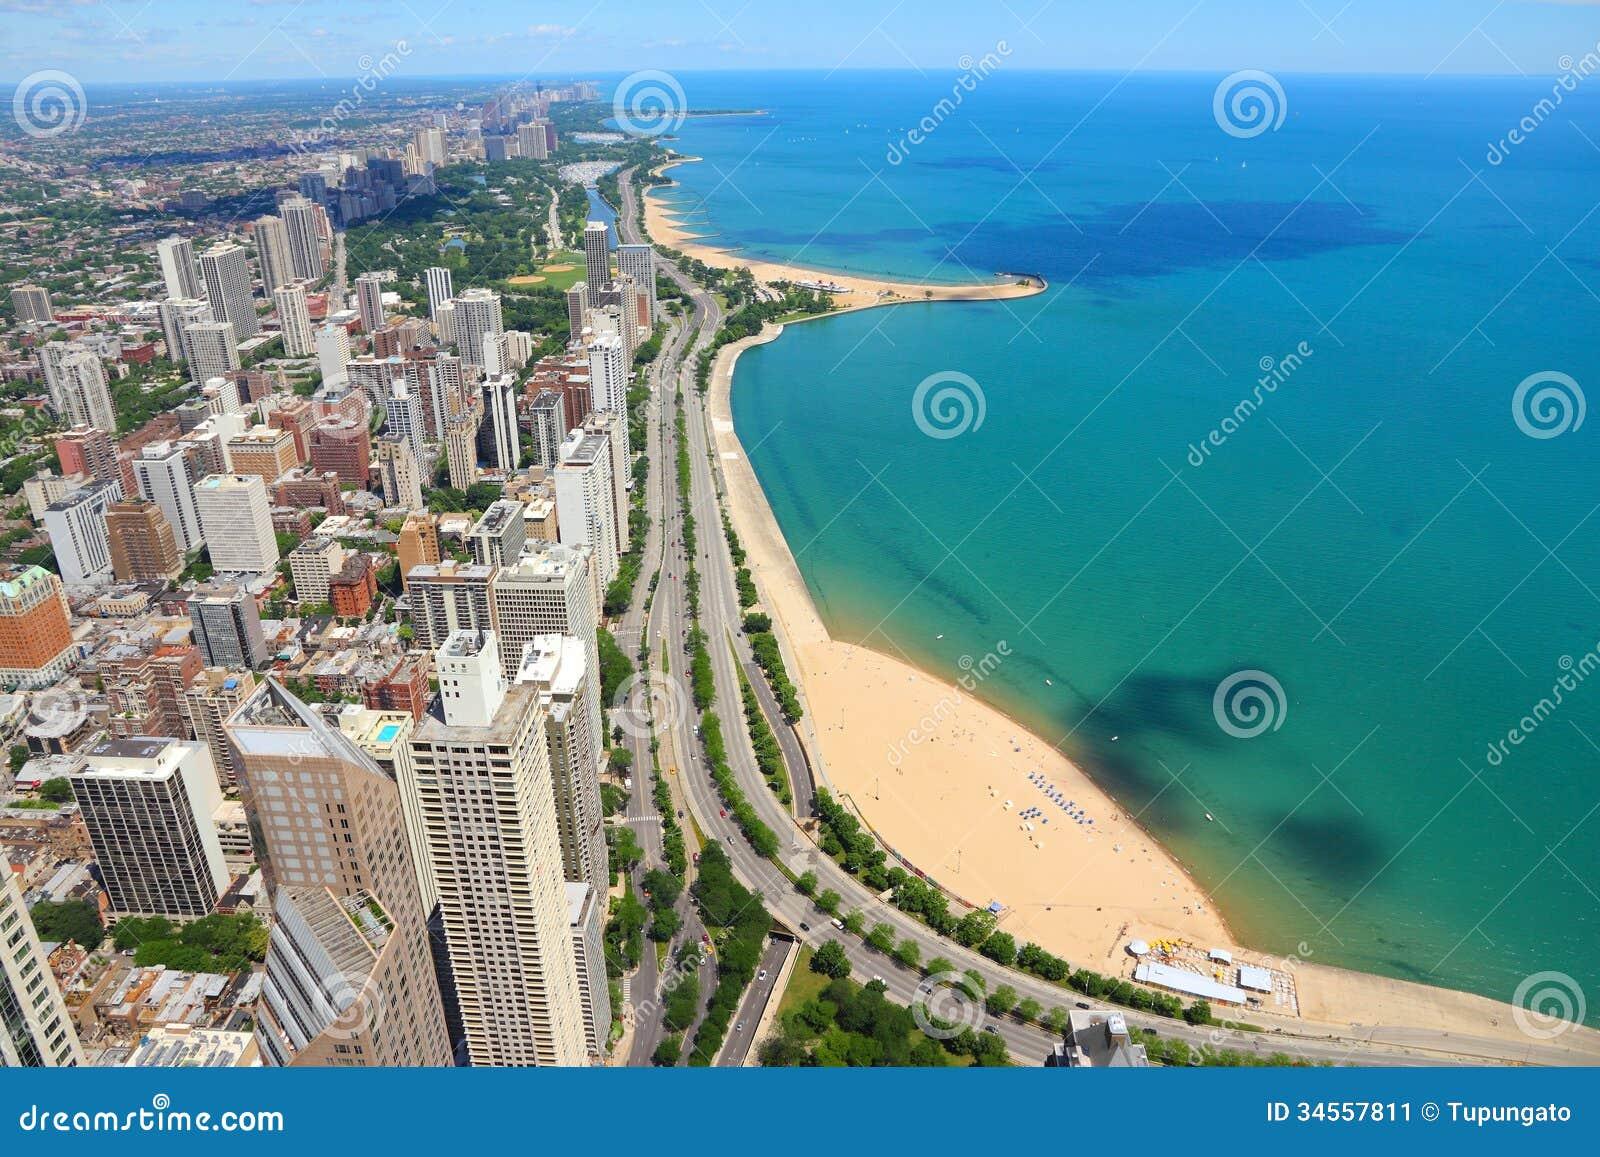 Miami To Panama City Drive Time